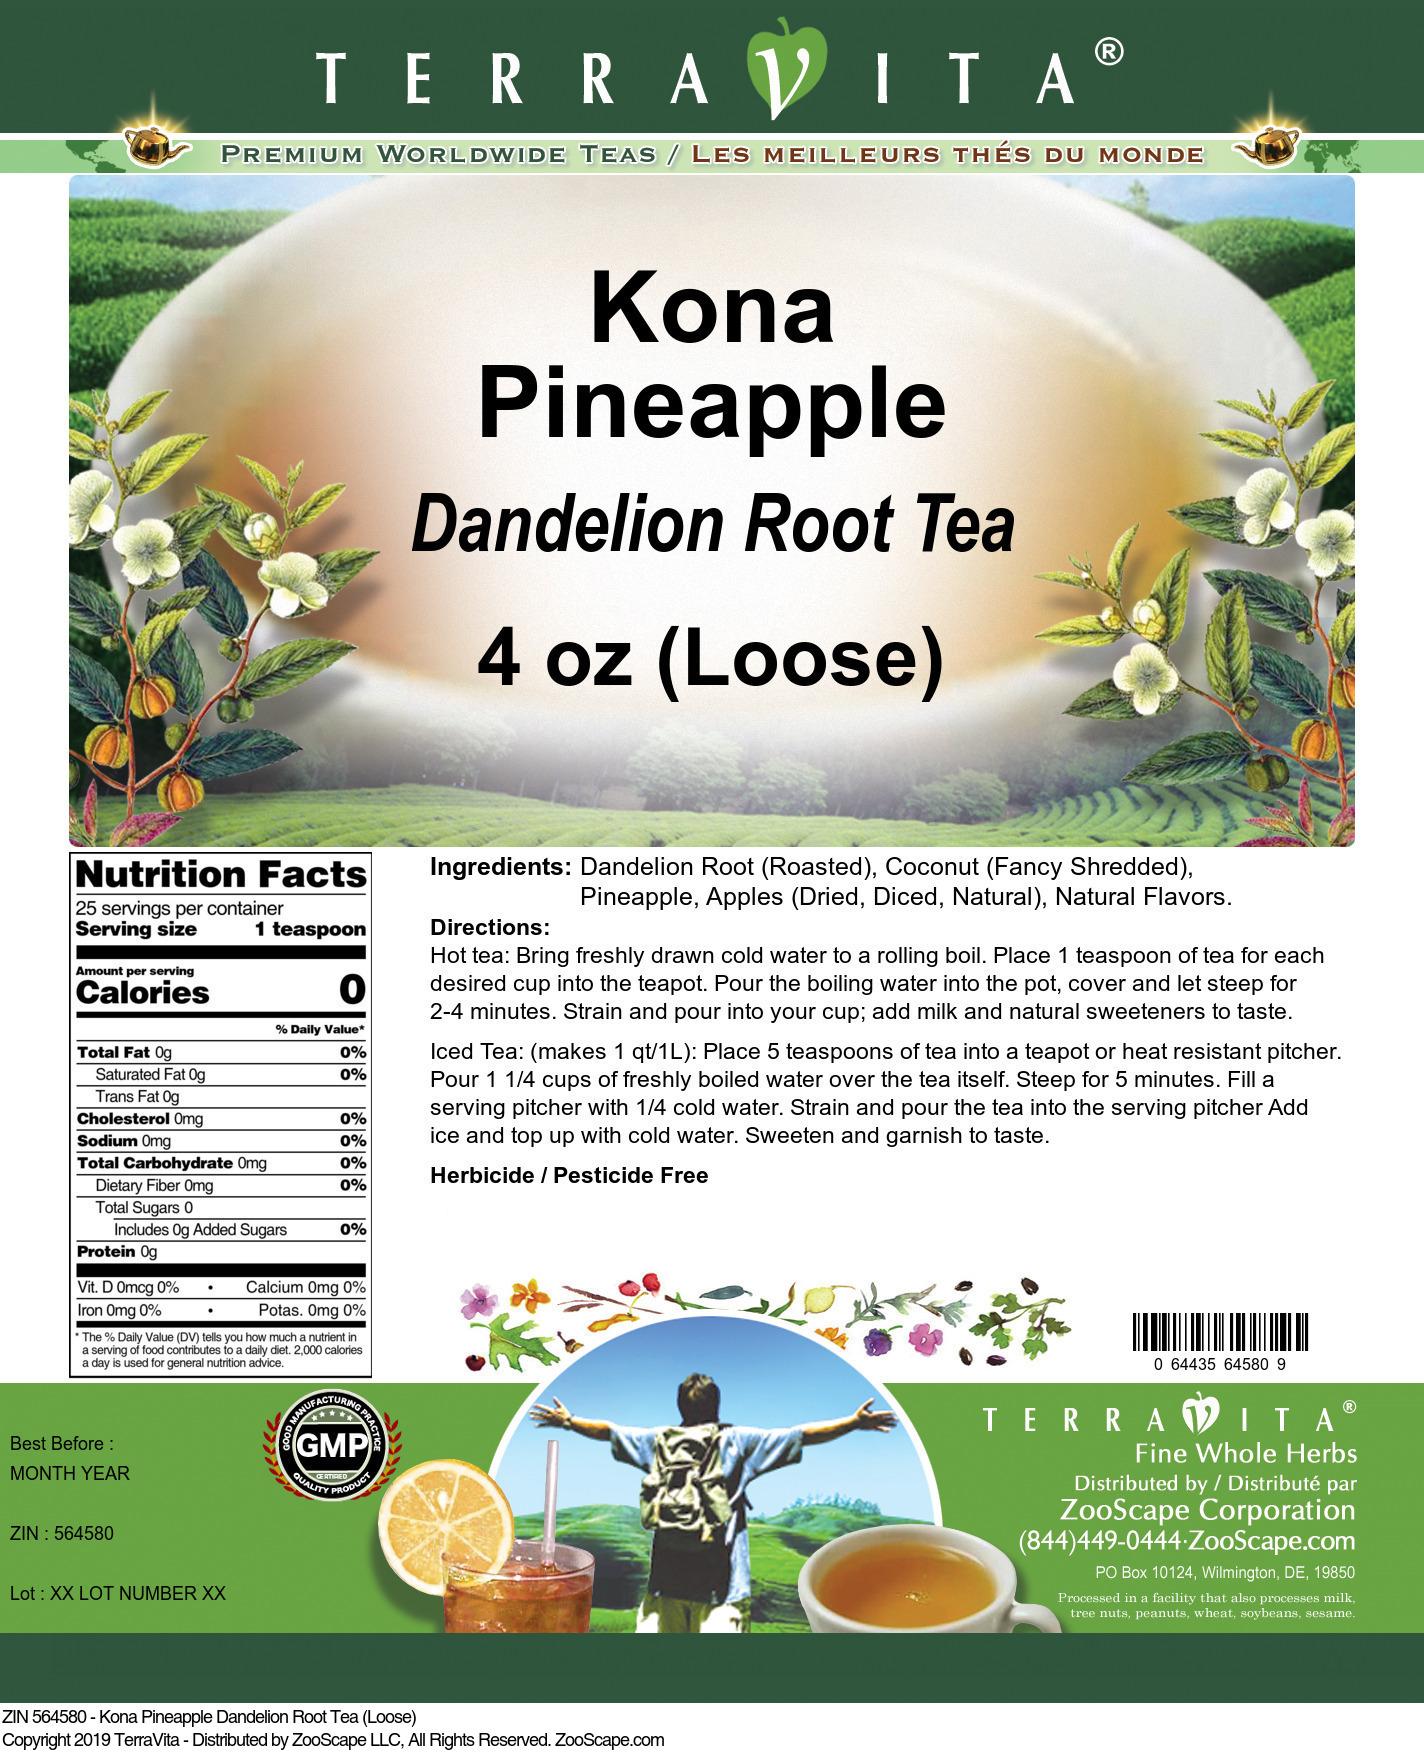 Kona Pineapple Dandelion Root Tea (Loose)